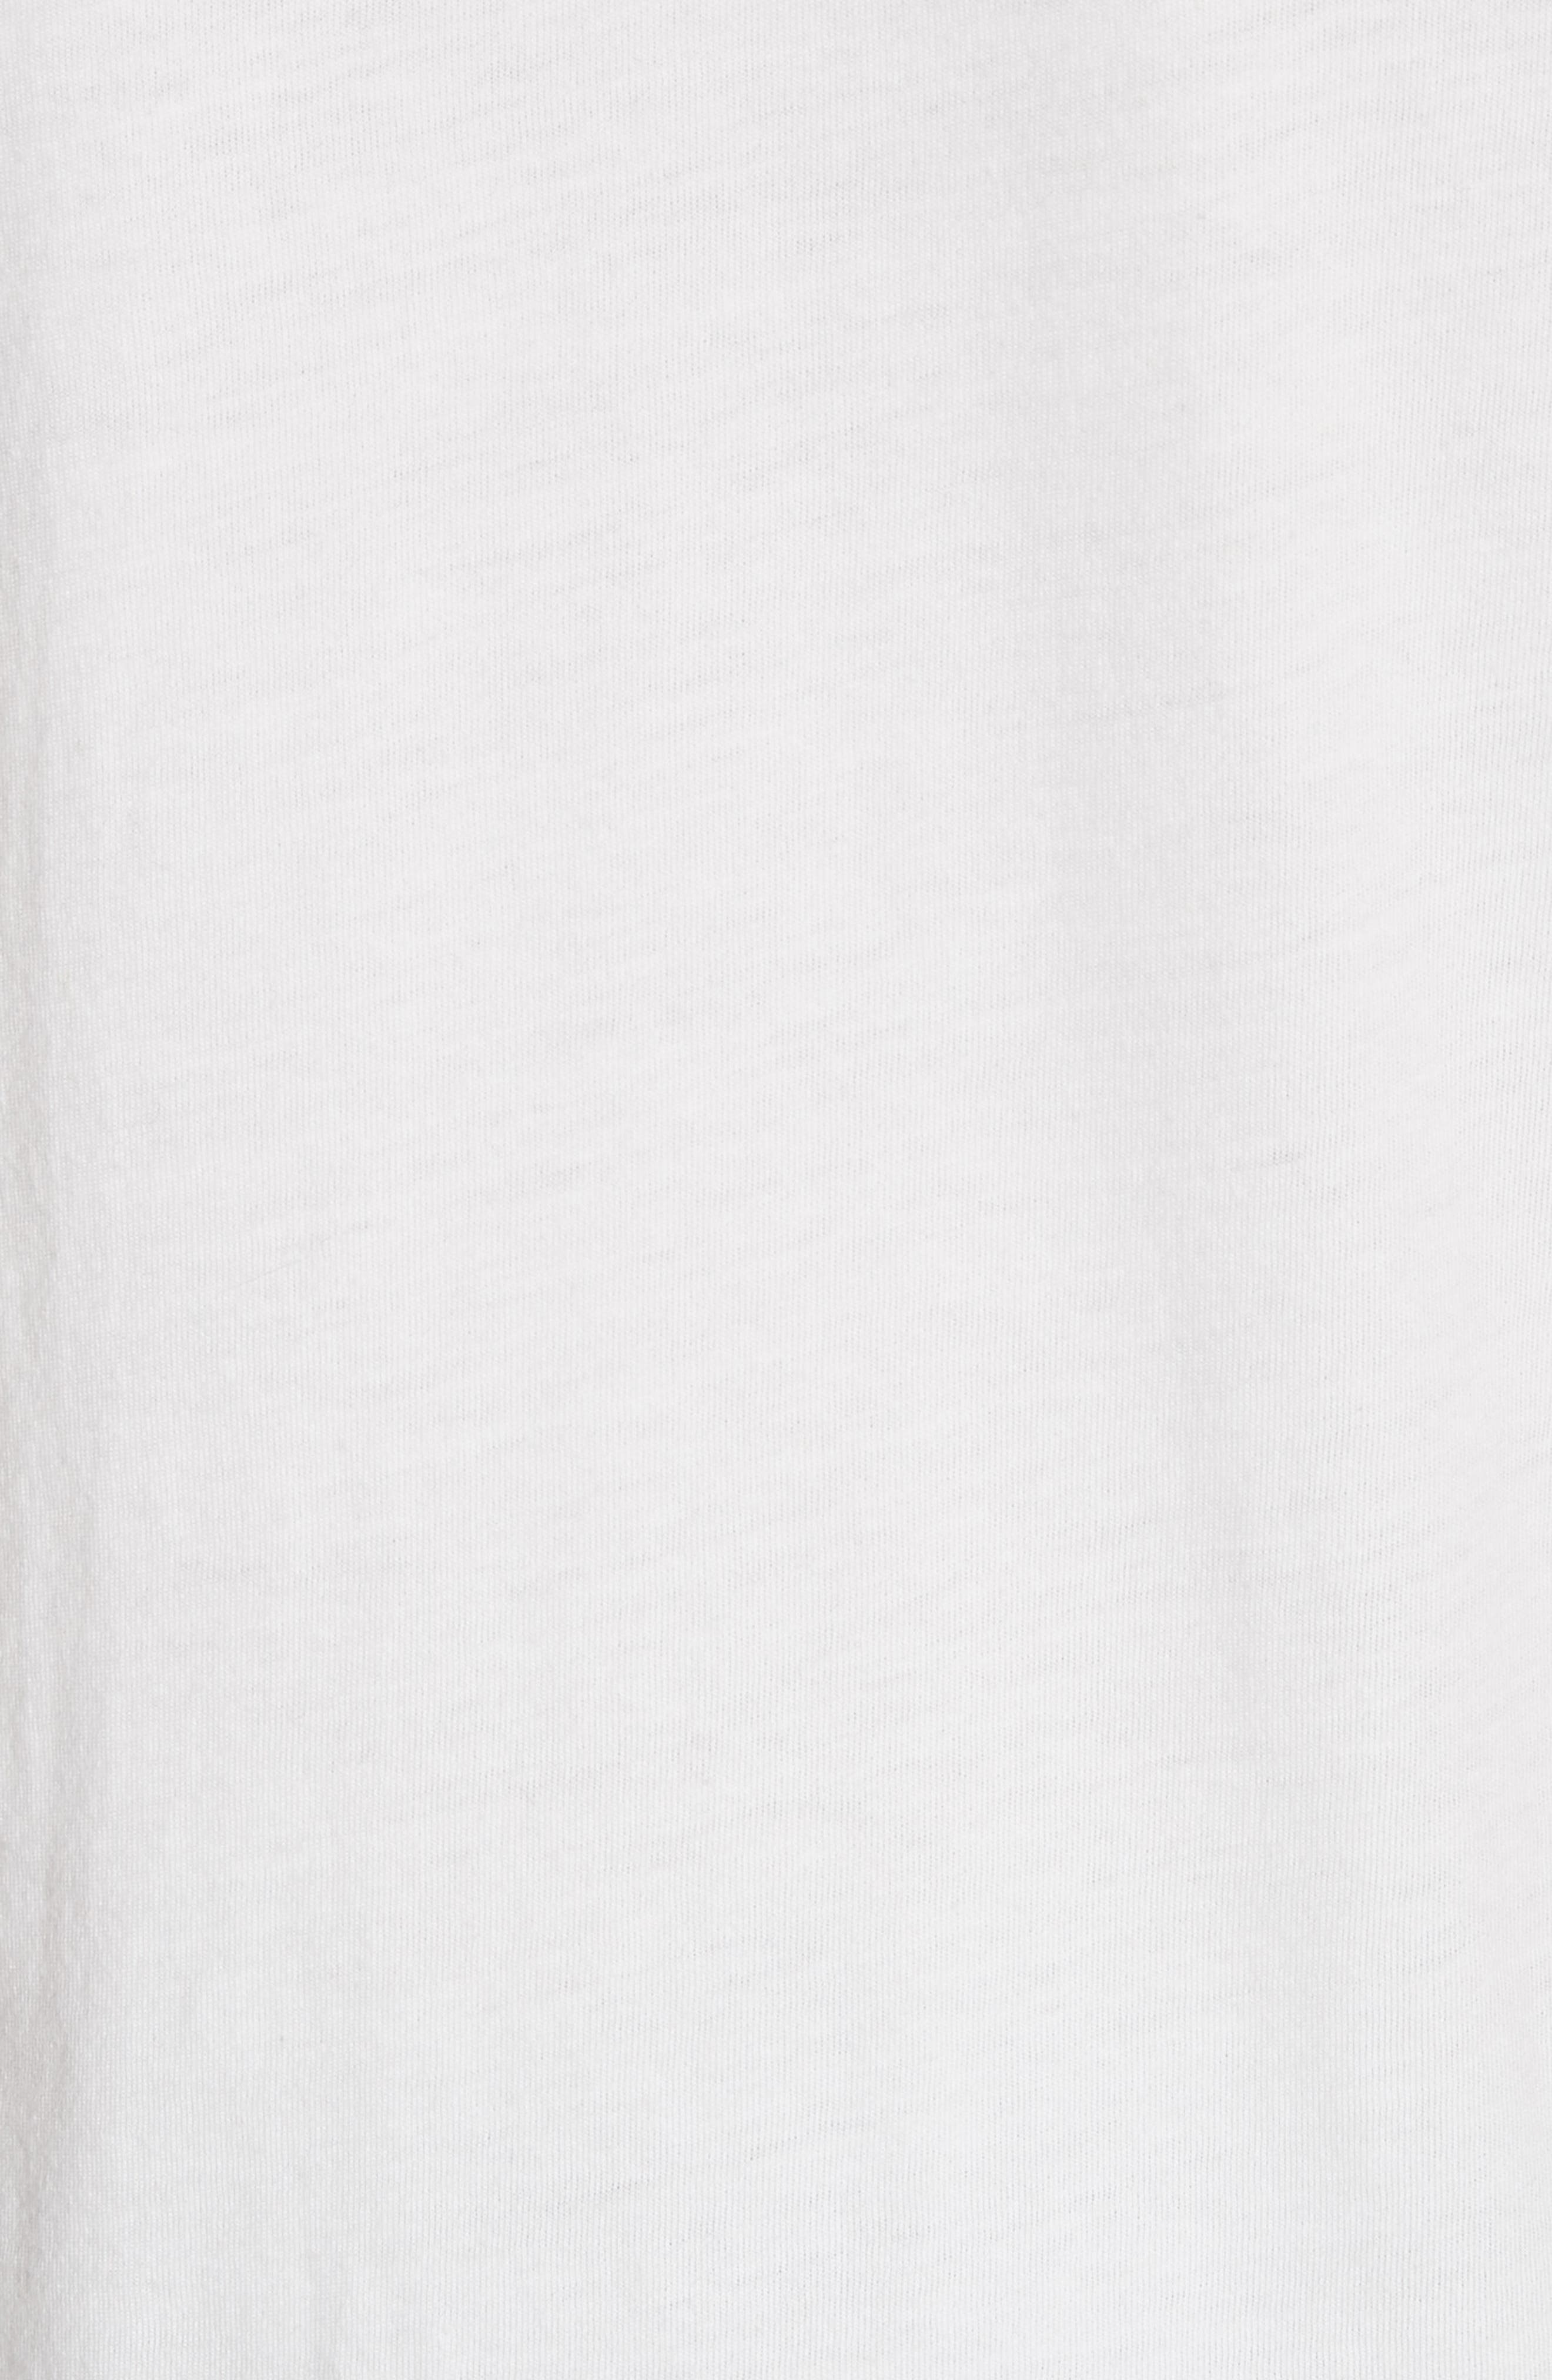 Rylyn Embellished Short Sleeve Tee,                             Alternate thumbnail 5, color,                             106